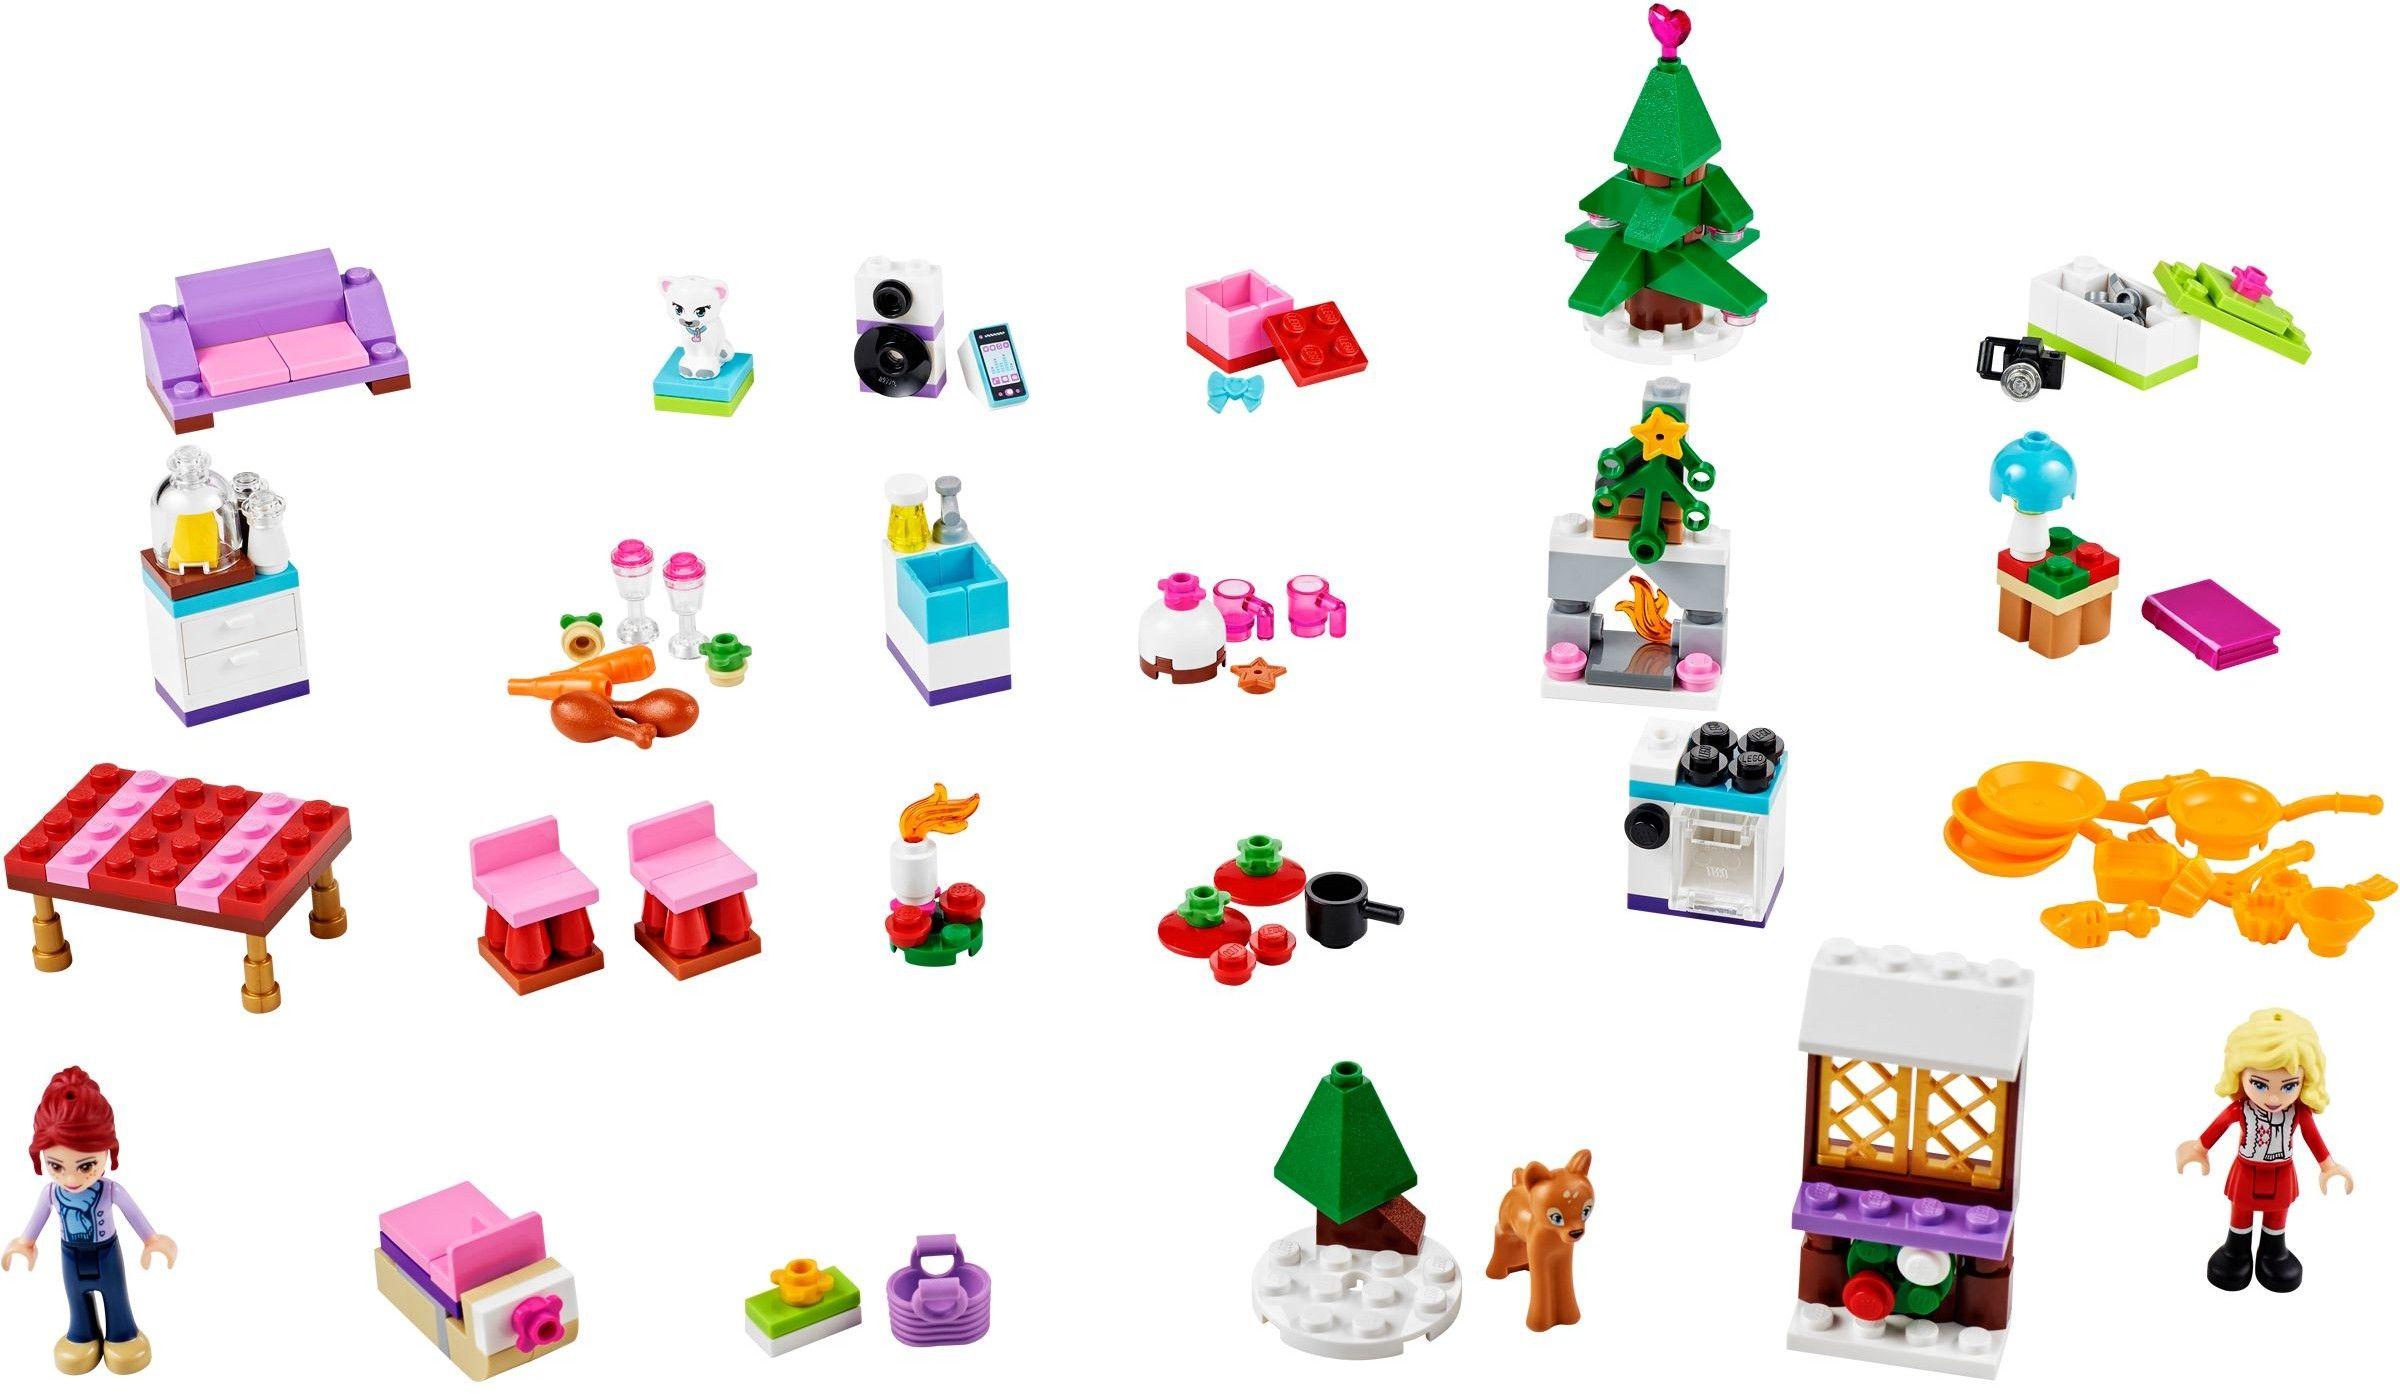 41040 1 Friends Advent Calendar Lego Ideas Mocs Figures And